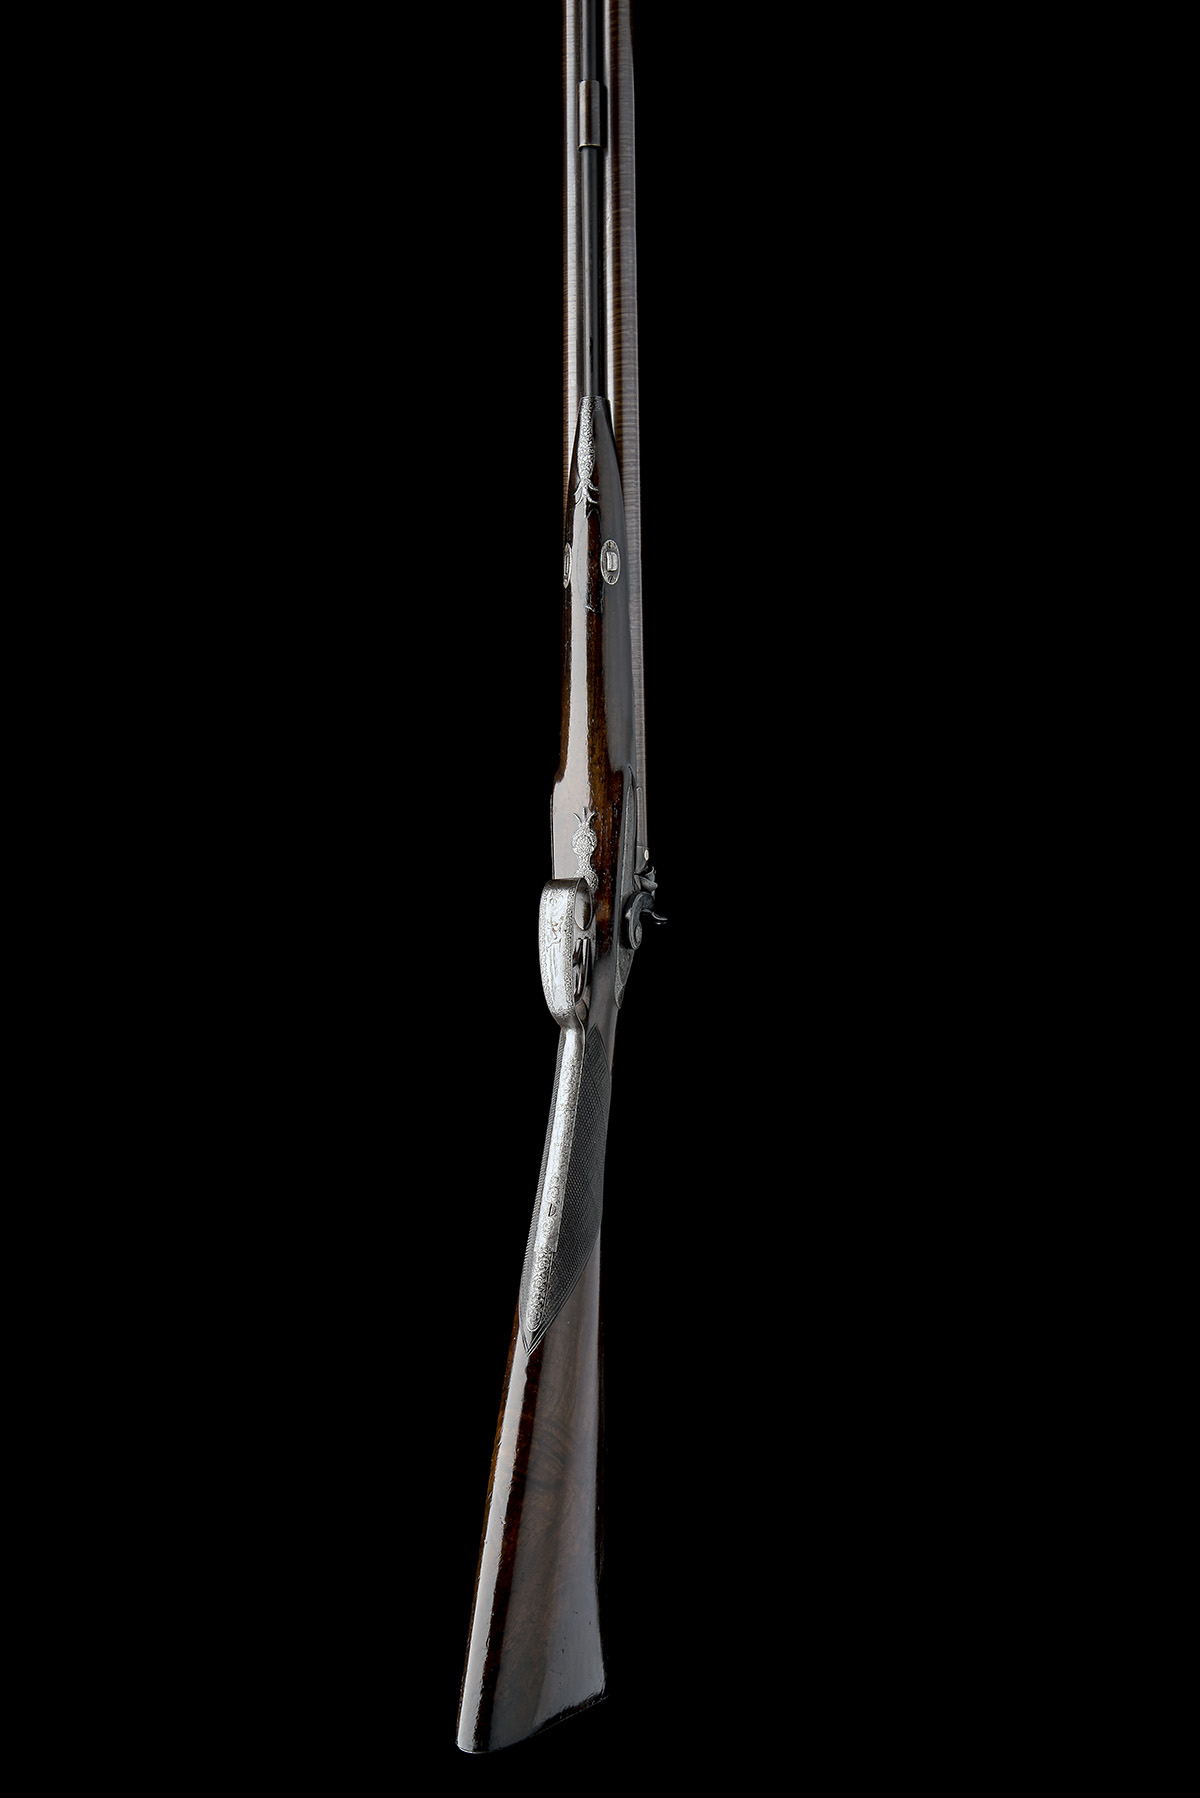 J.W. EDGE, MANCHESTER A 14-BORE PERCUSSION DOUBLE-BARRELLED SPORTING-GUN, serial no. 1350, circa - Image 5 of 8